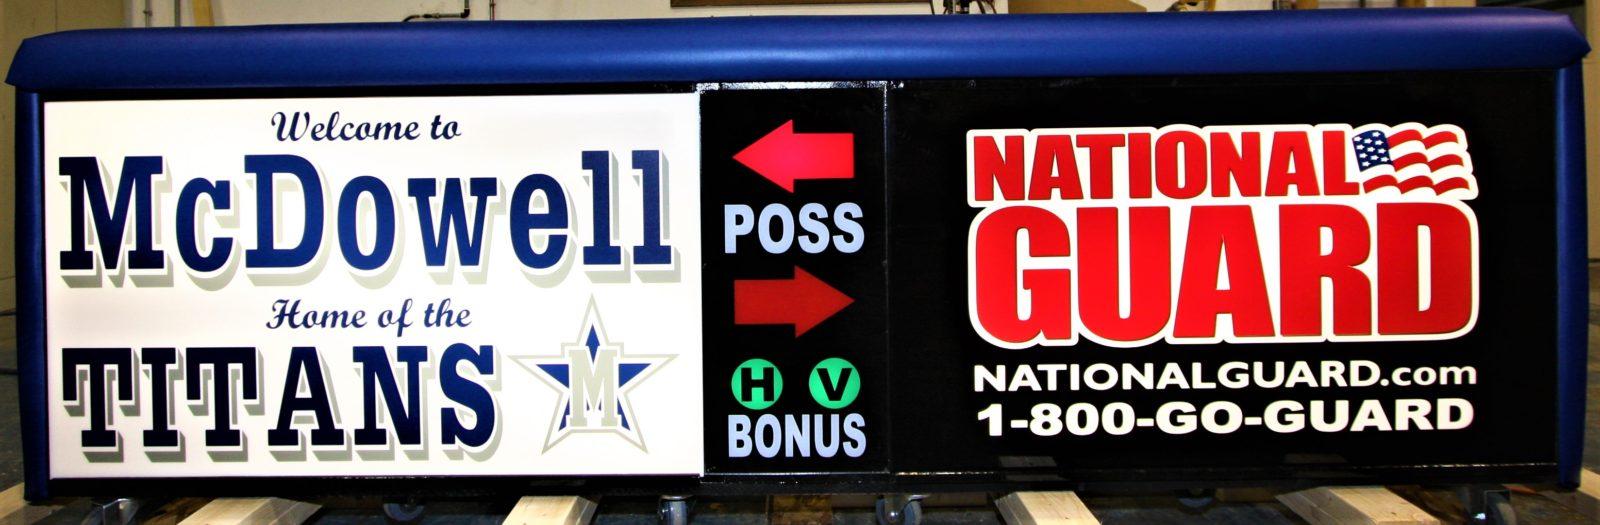 McDowell high scool scoring table North Carolina Army National Guard NCARNG